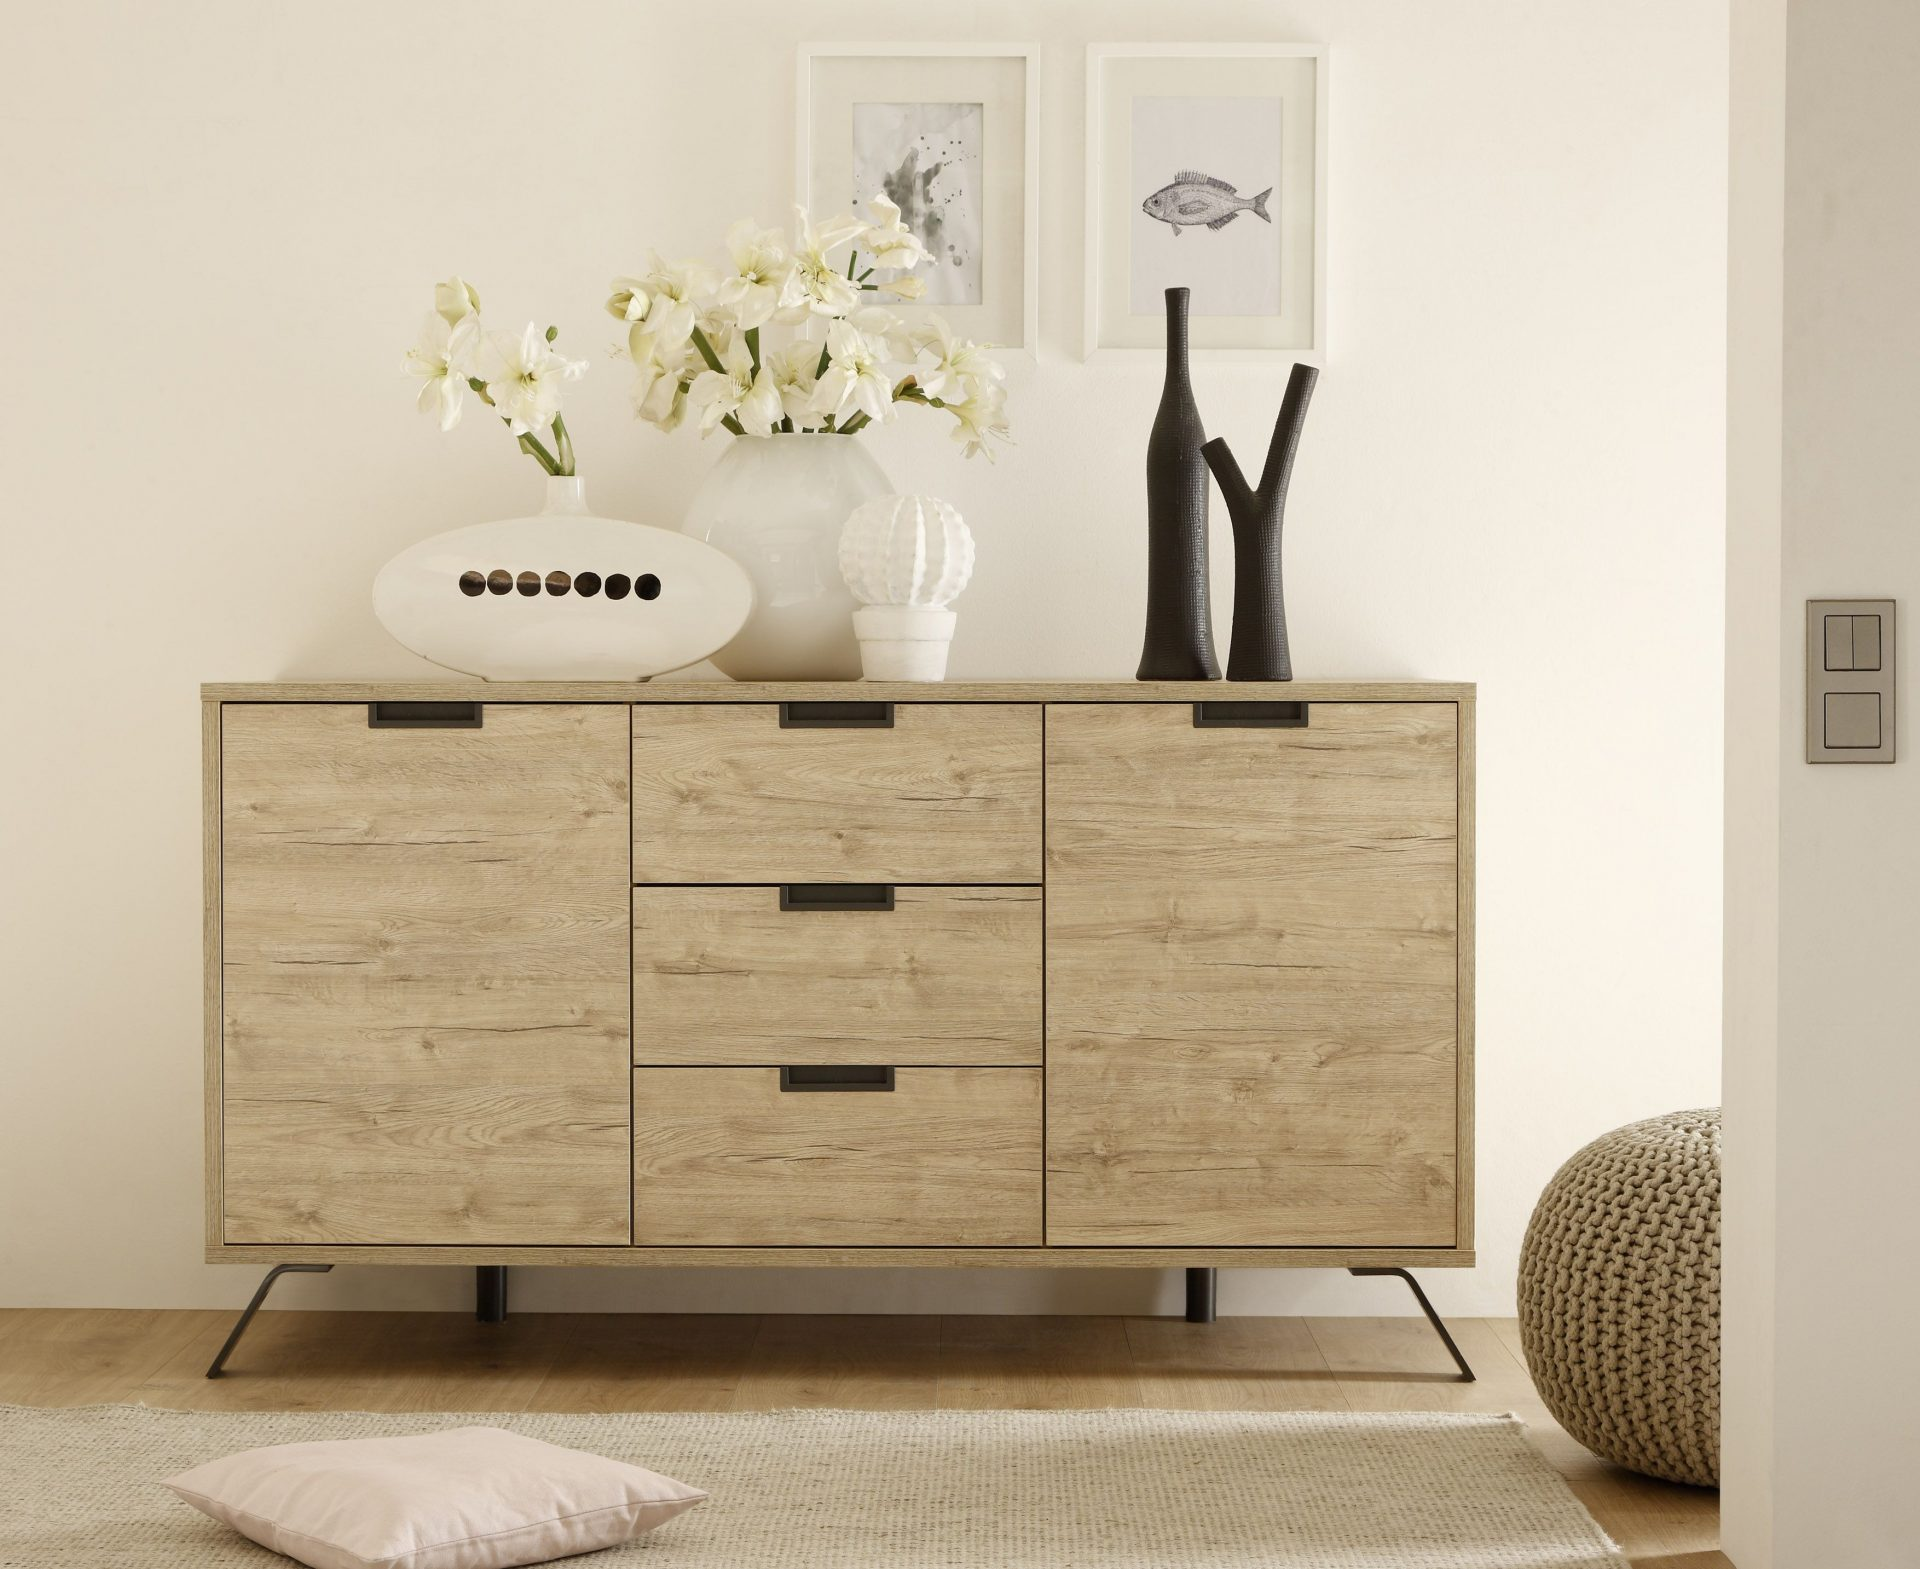 De leukste houten meubels for Houten meubels woonkamer